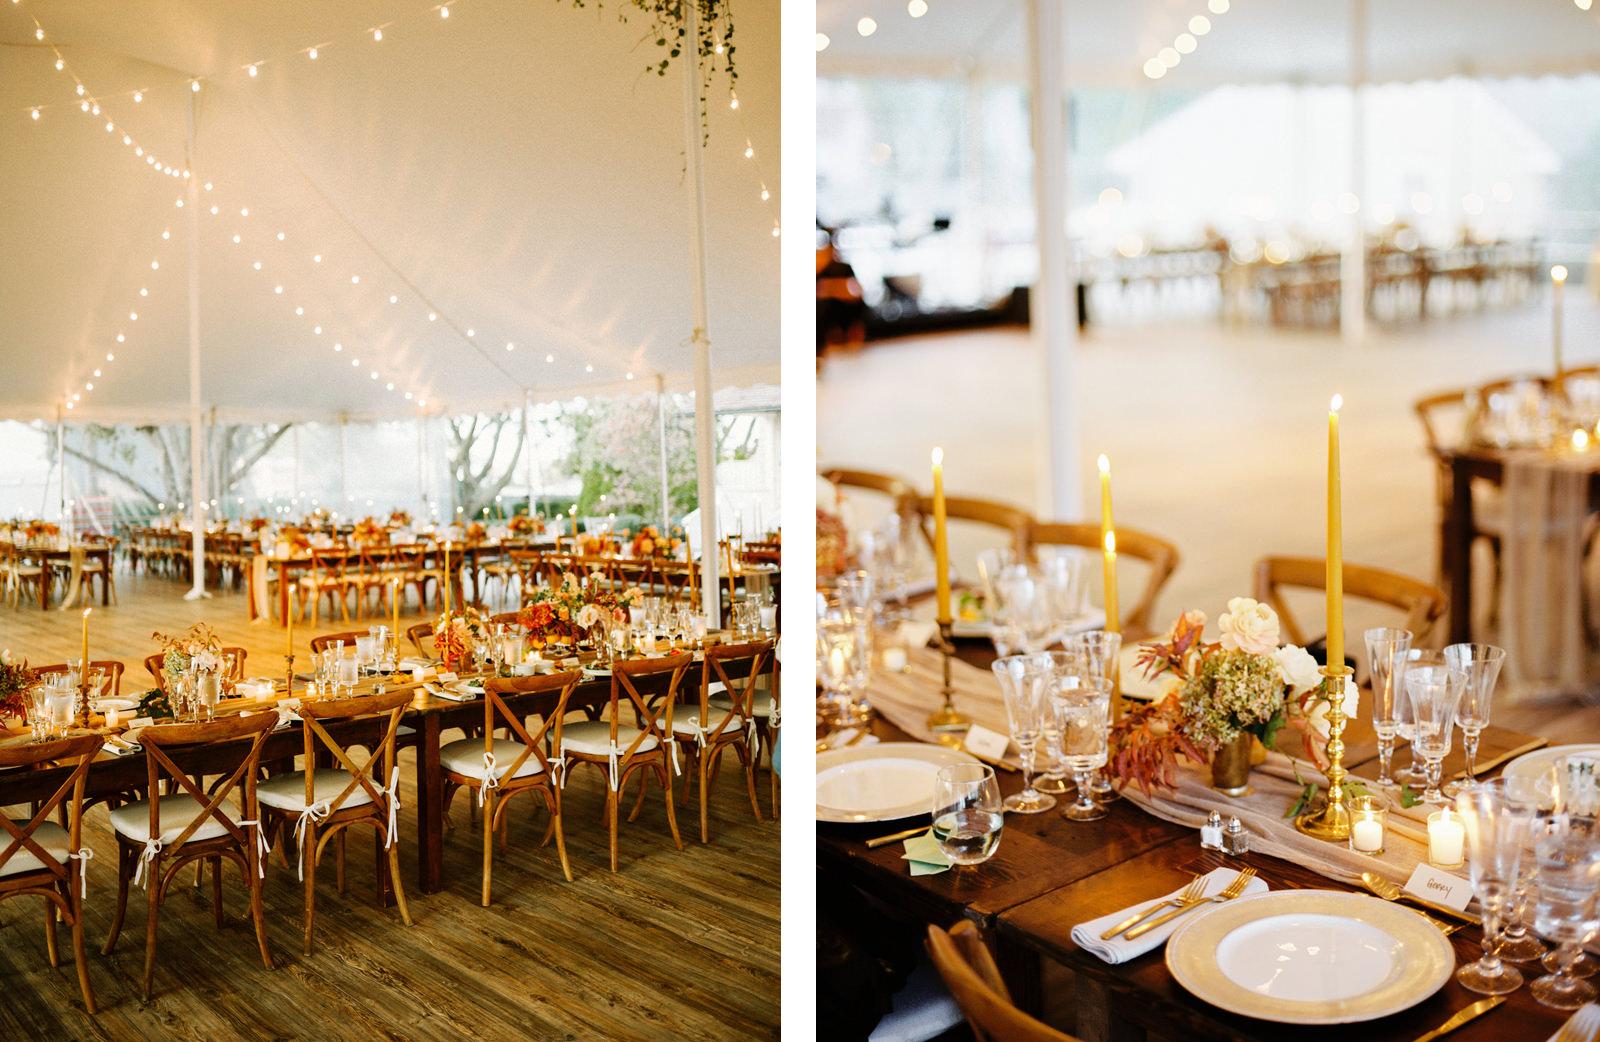 bridgeport-wedding-132 BRIDGEPORT, CONNECTICUT BACKYARD WEDDING